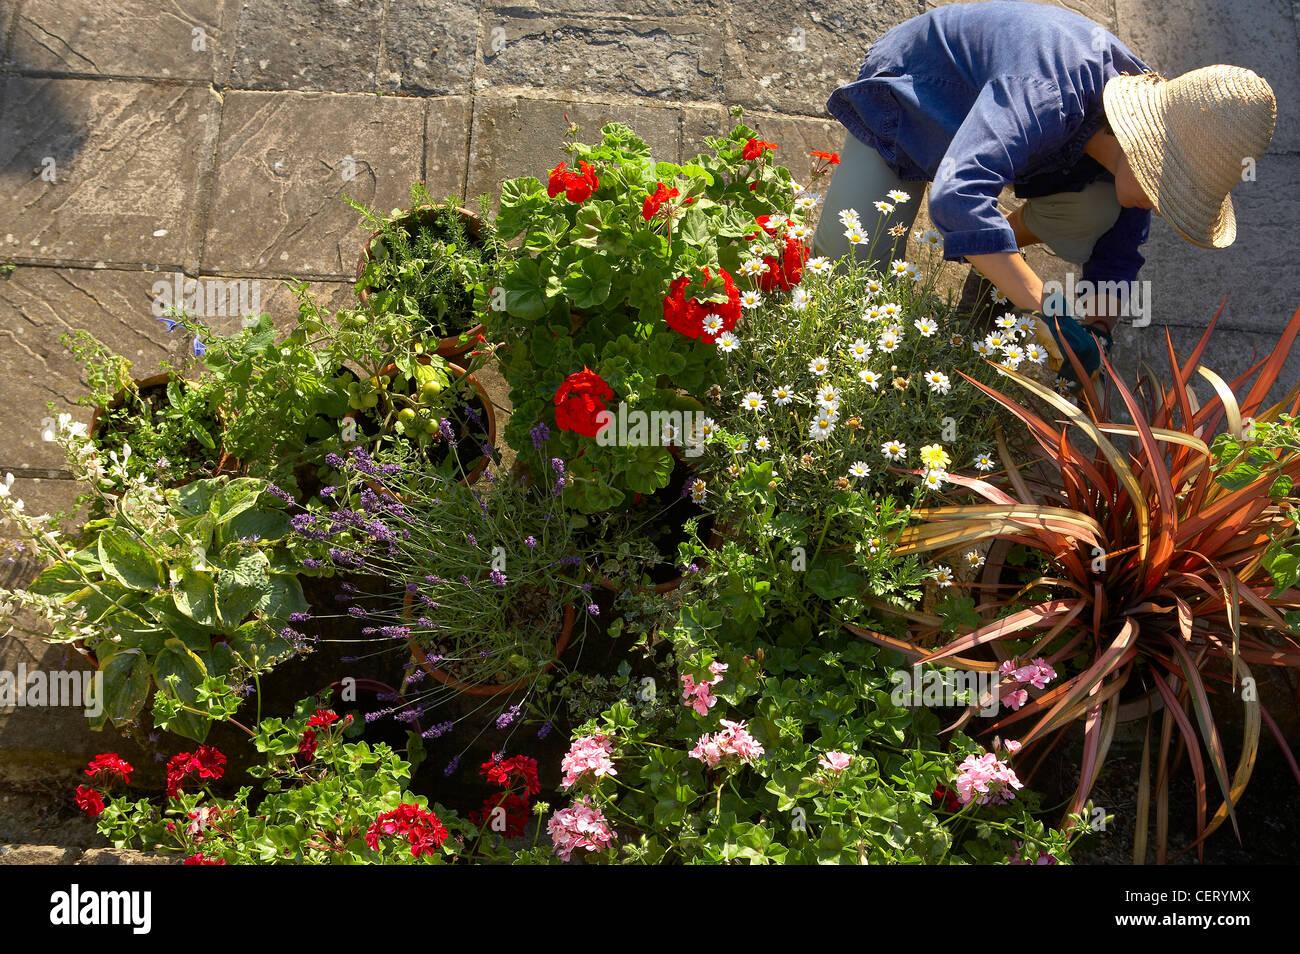 woman (model released) tending flower pots in a garden, Dorset, England, UK - Stock Image